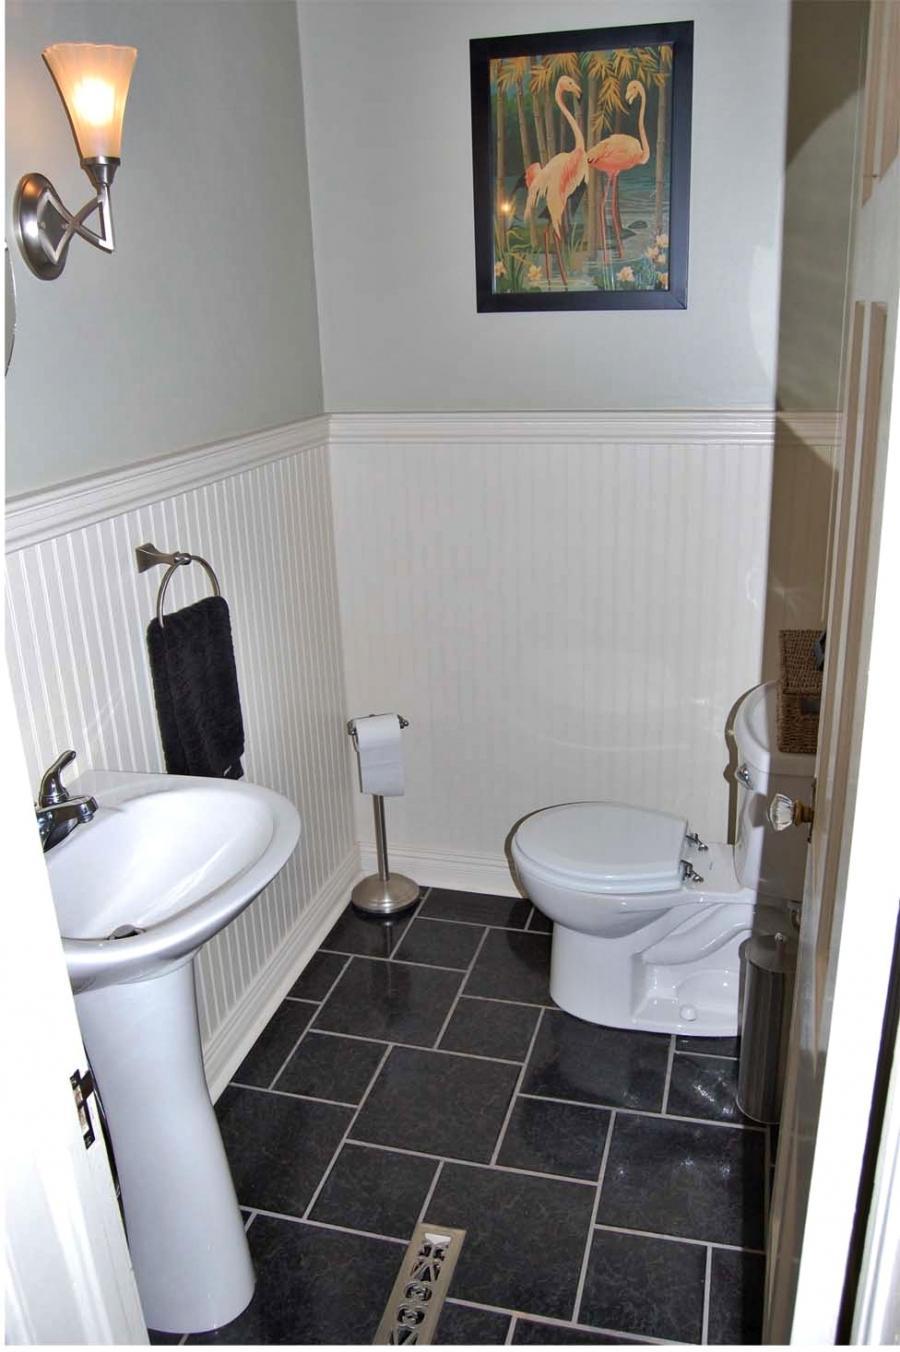 1940 bathroom photo